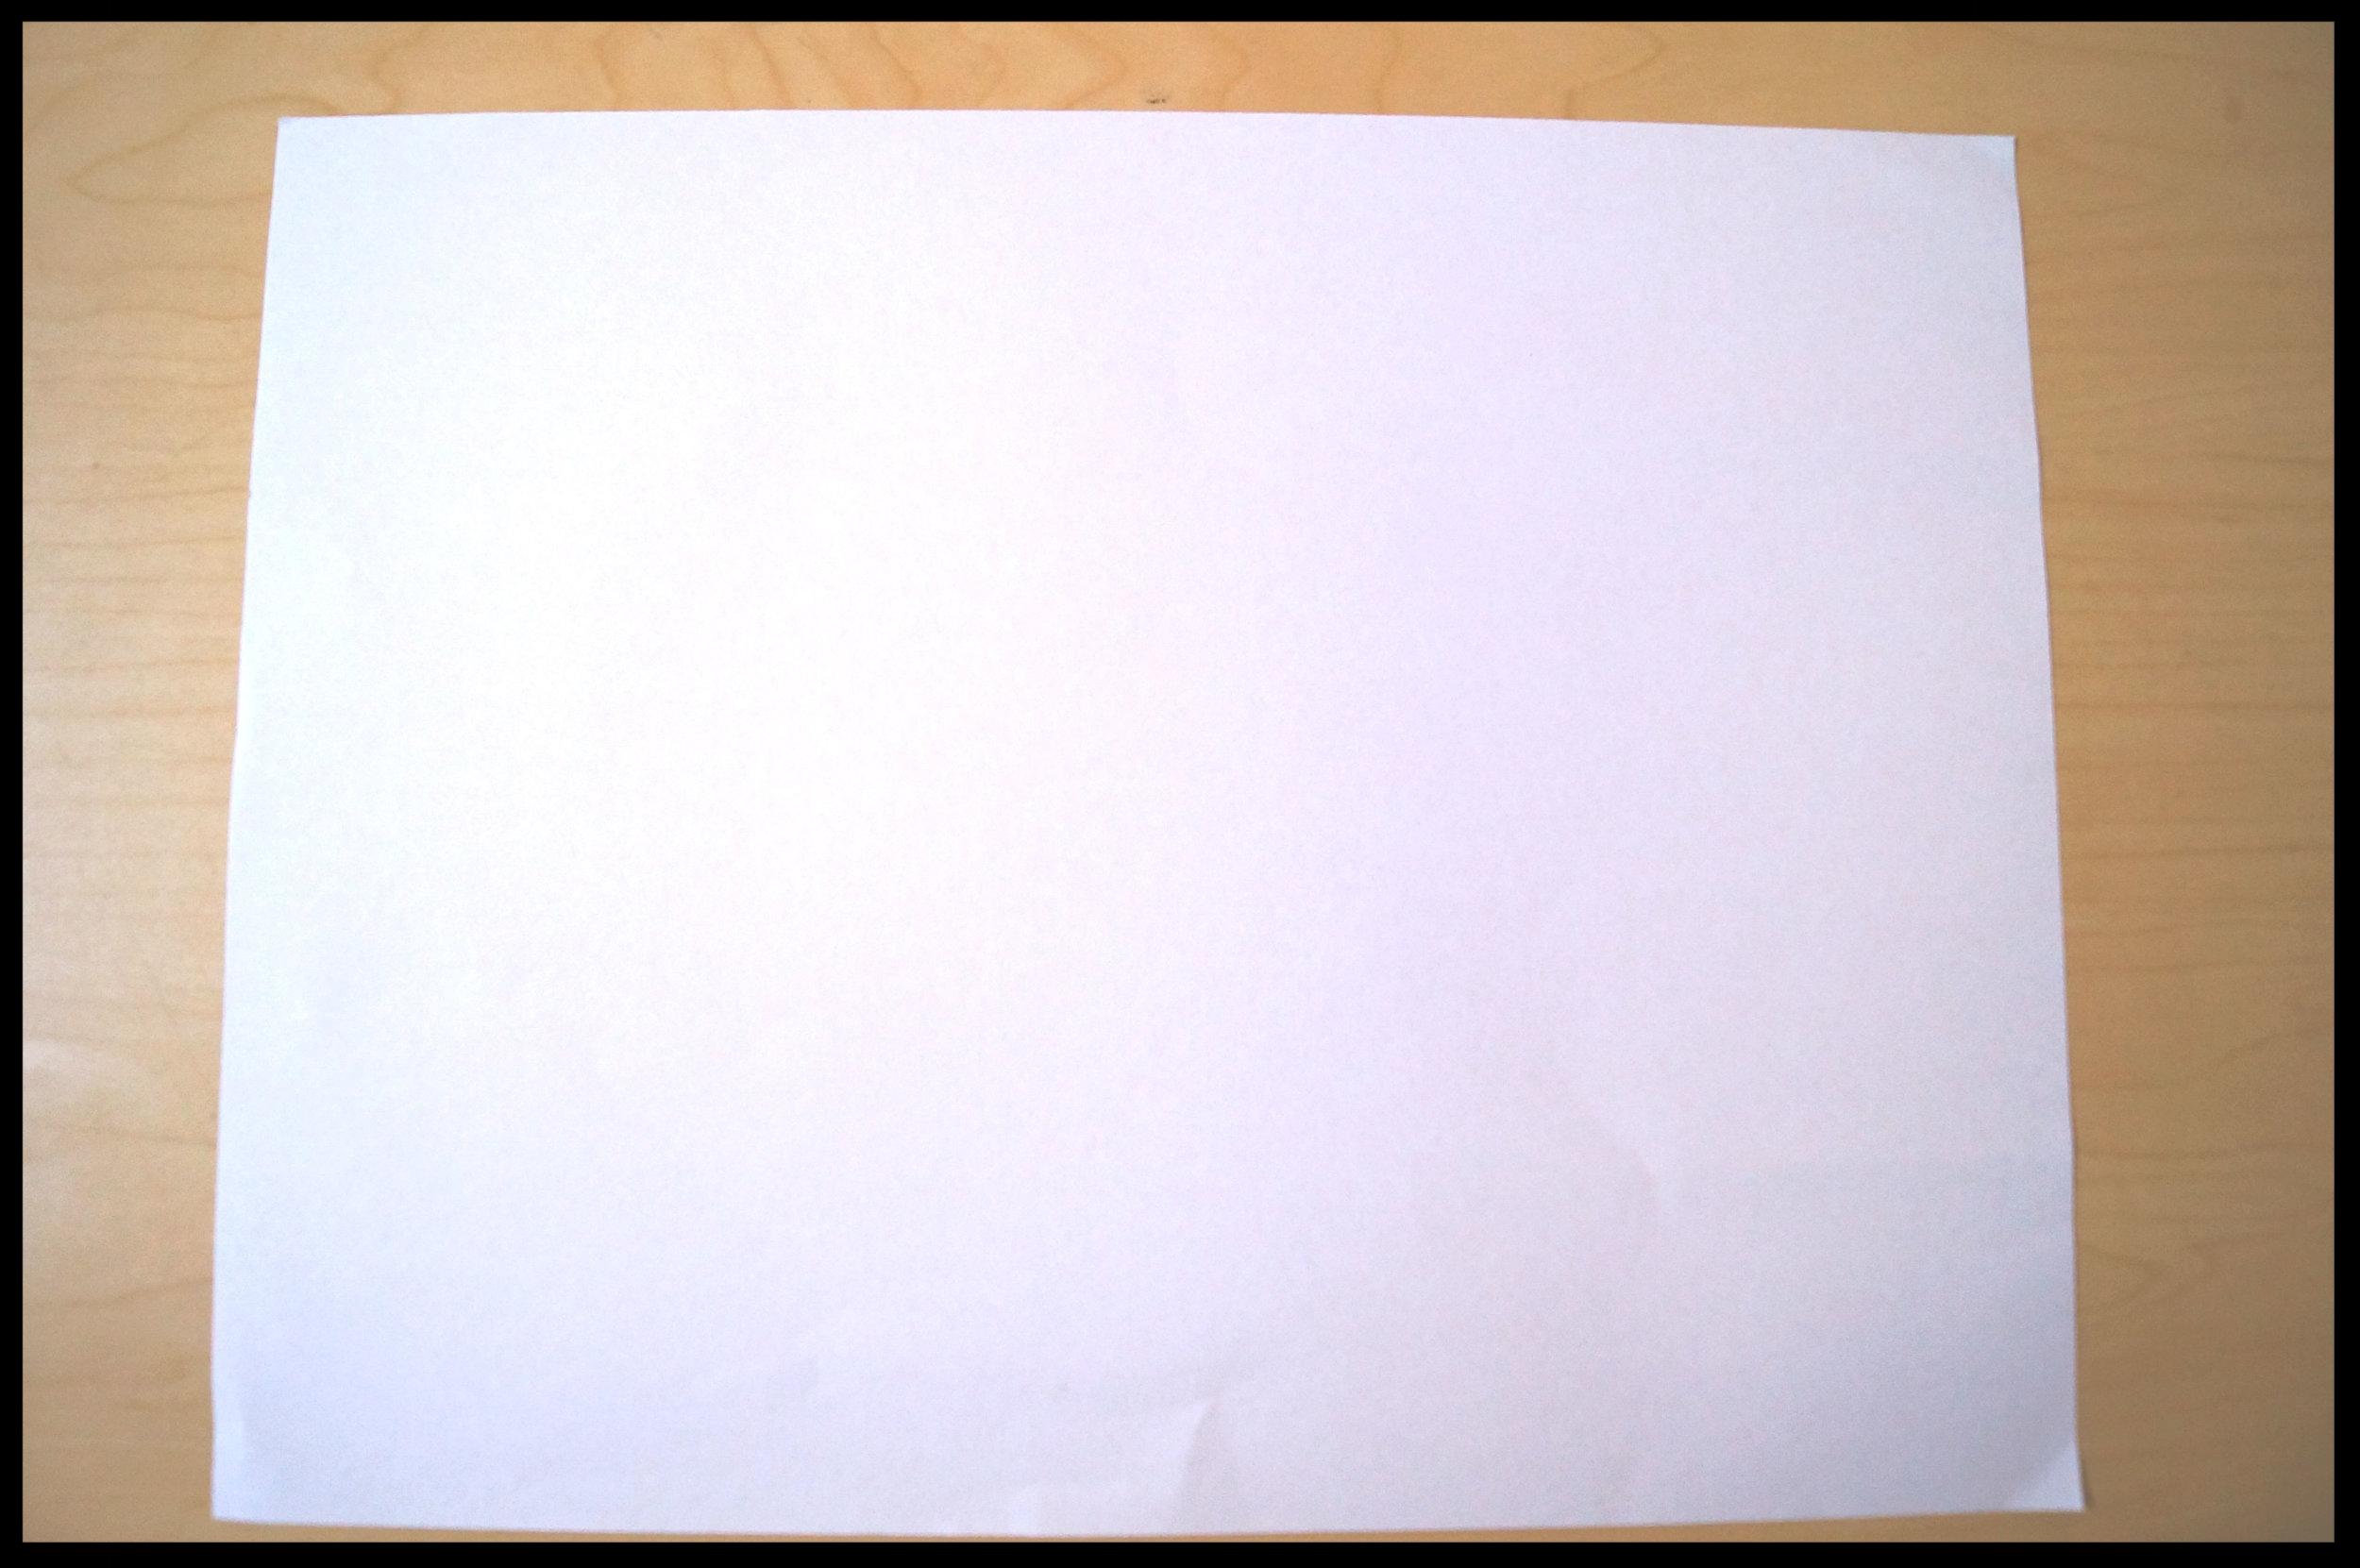 1. Lay one sheet of paper horizontally.